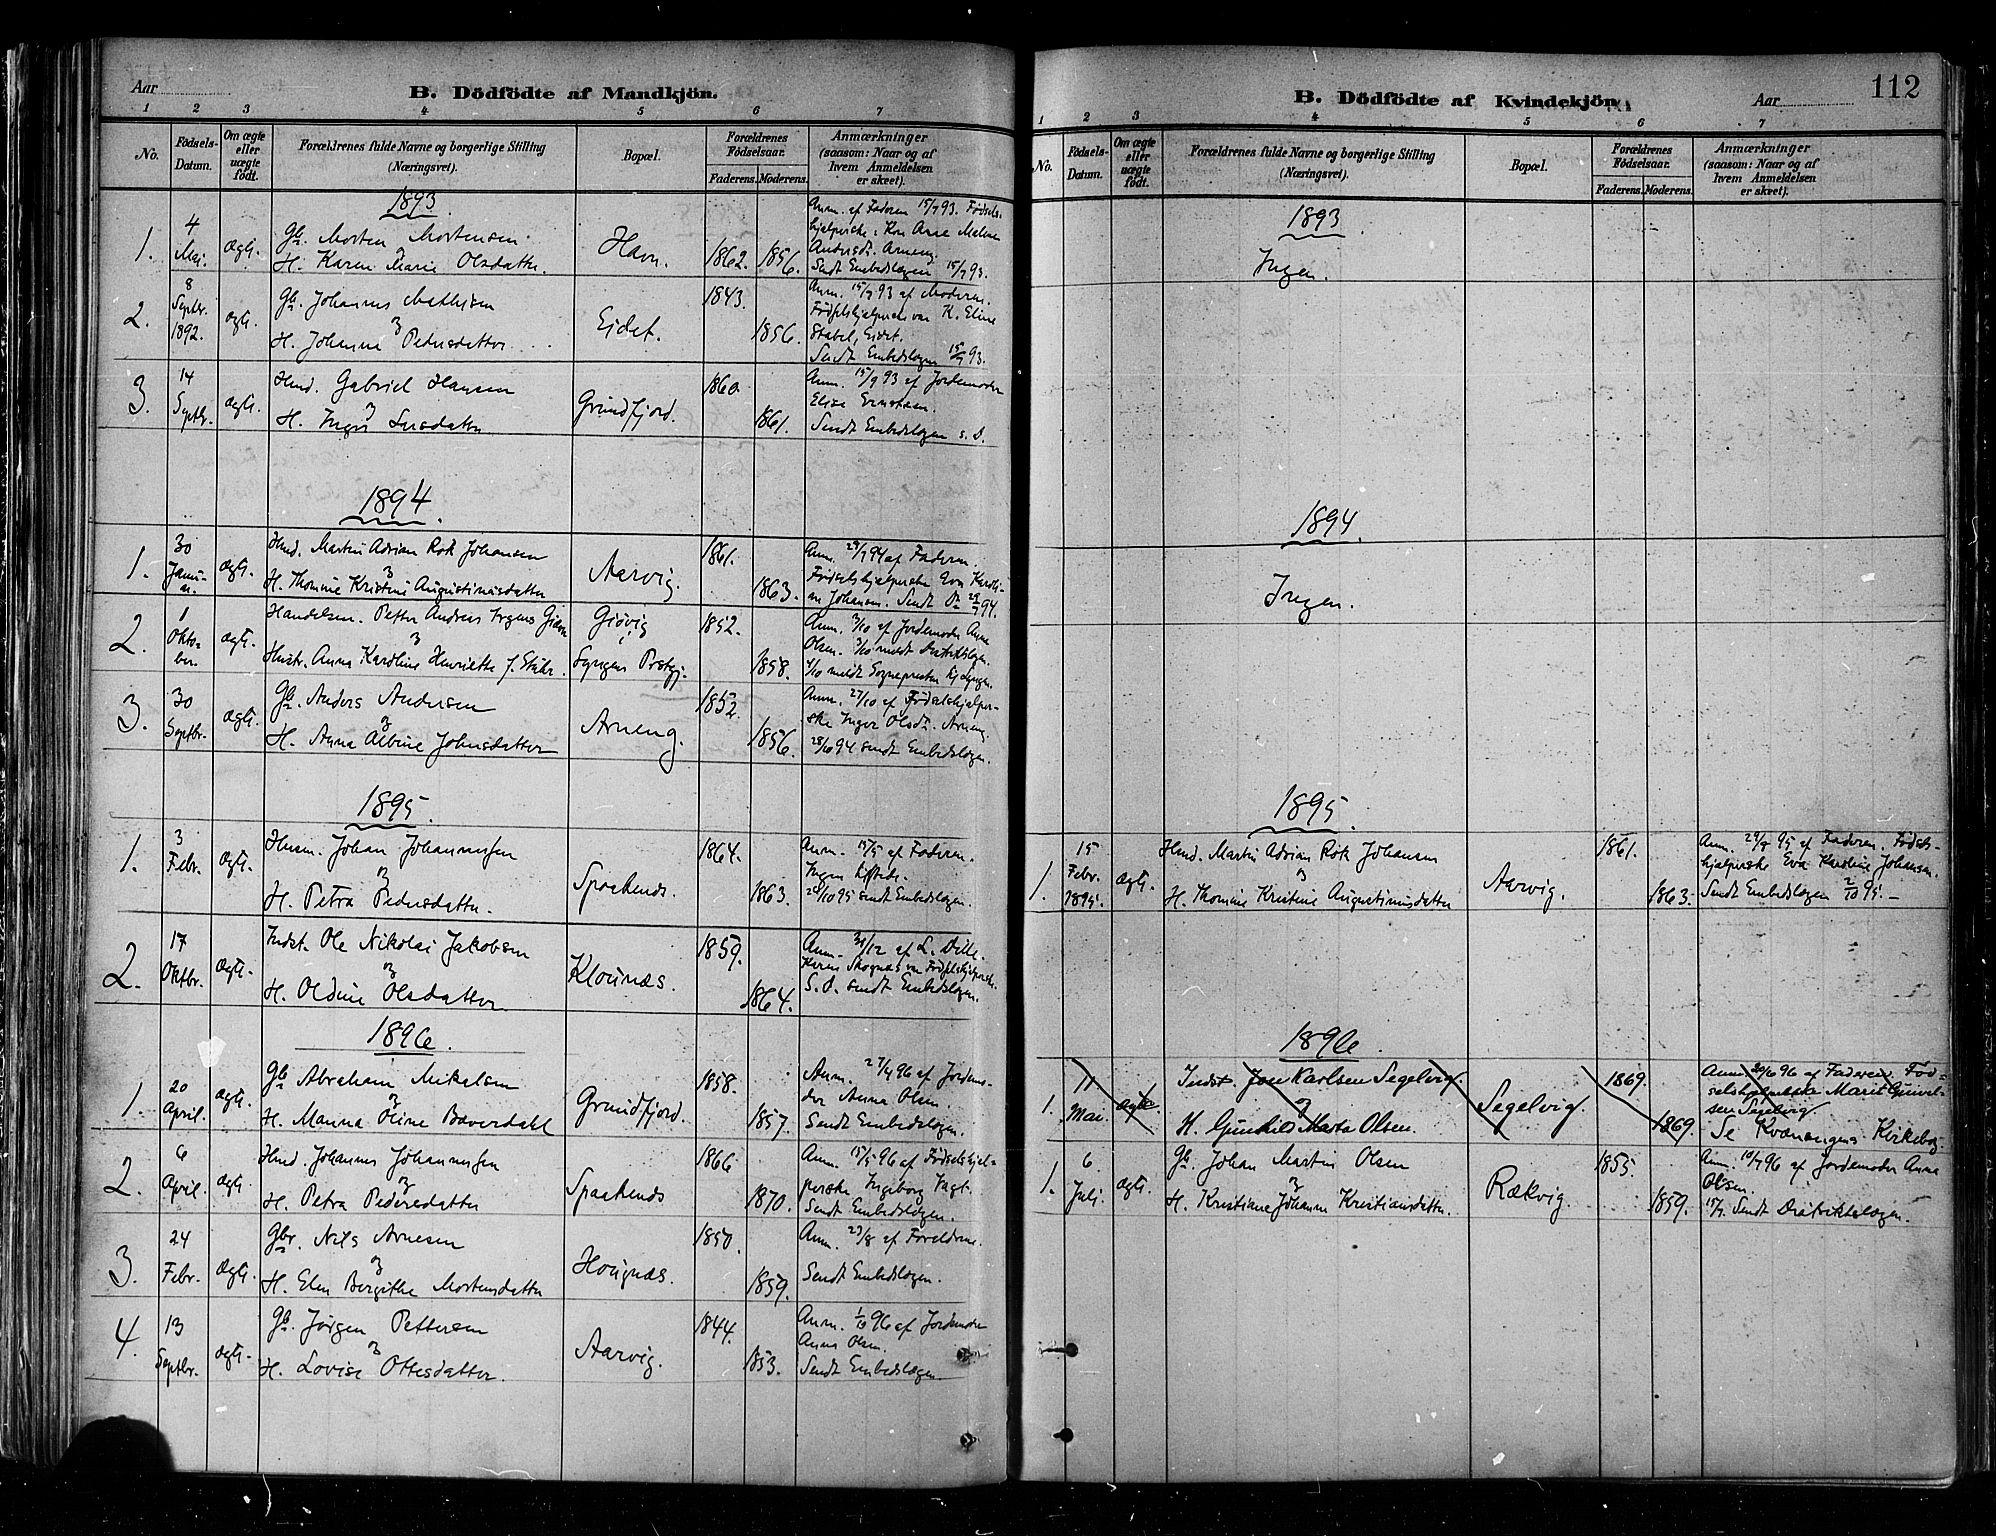 SATØ, Skjervøy sokneprestkontor, H/Ha/Haa/L0010kirke: Ministerialbok nr. 10, 1887-1898, s. 112